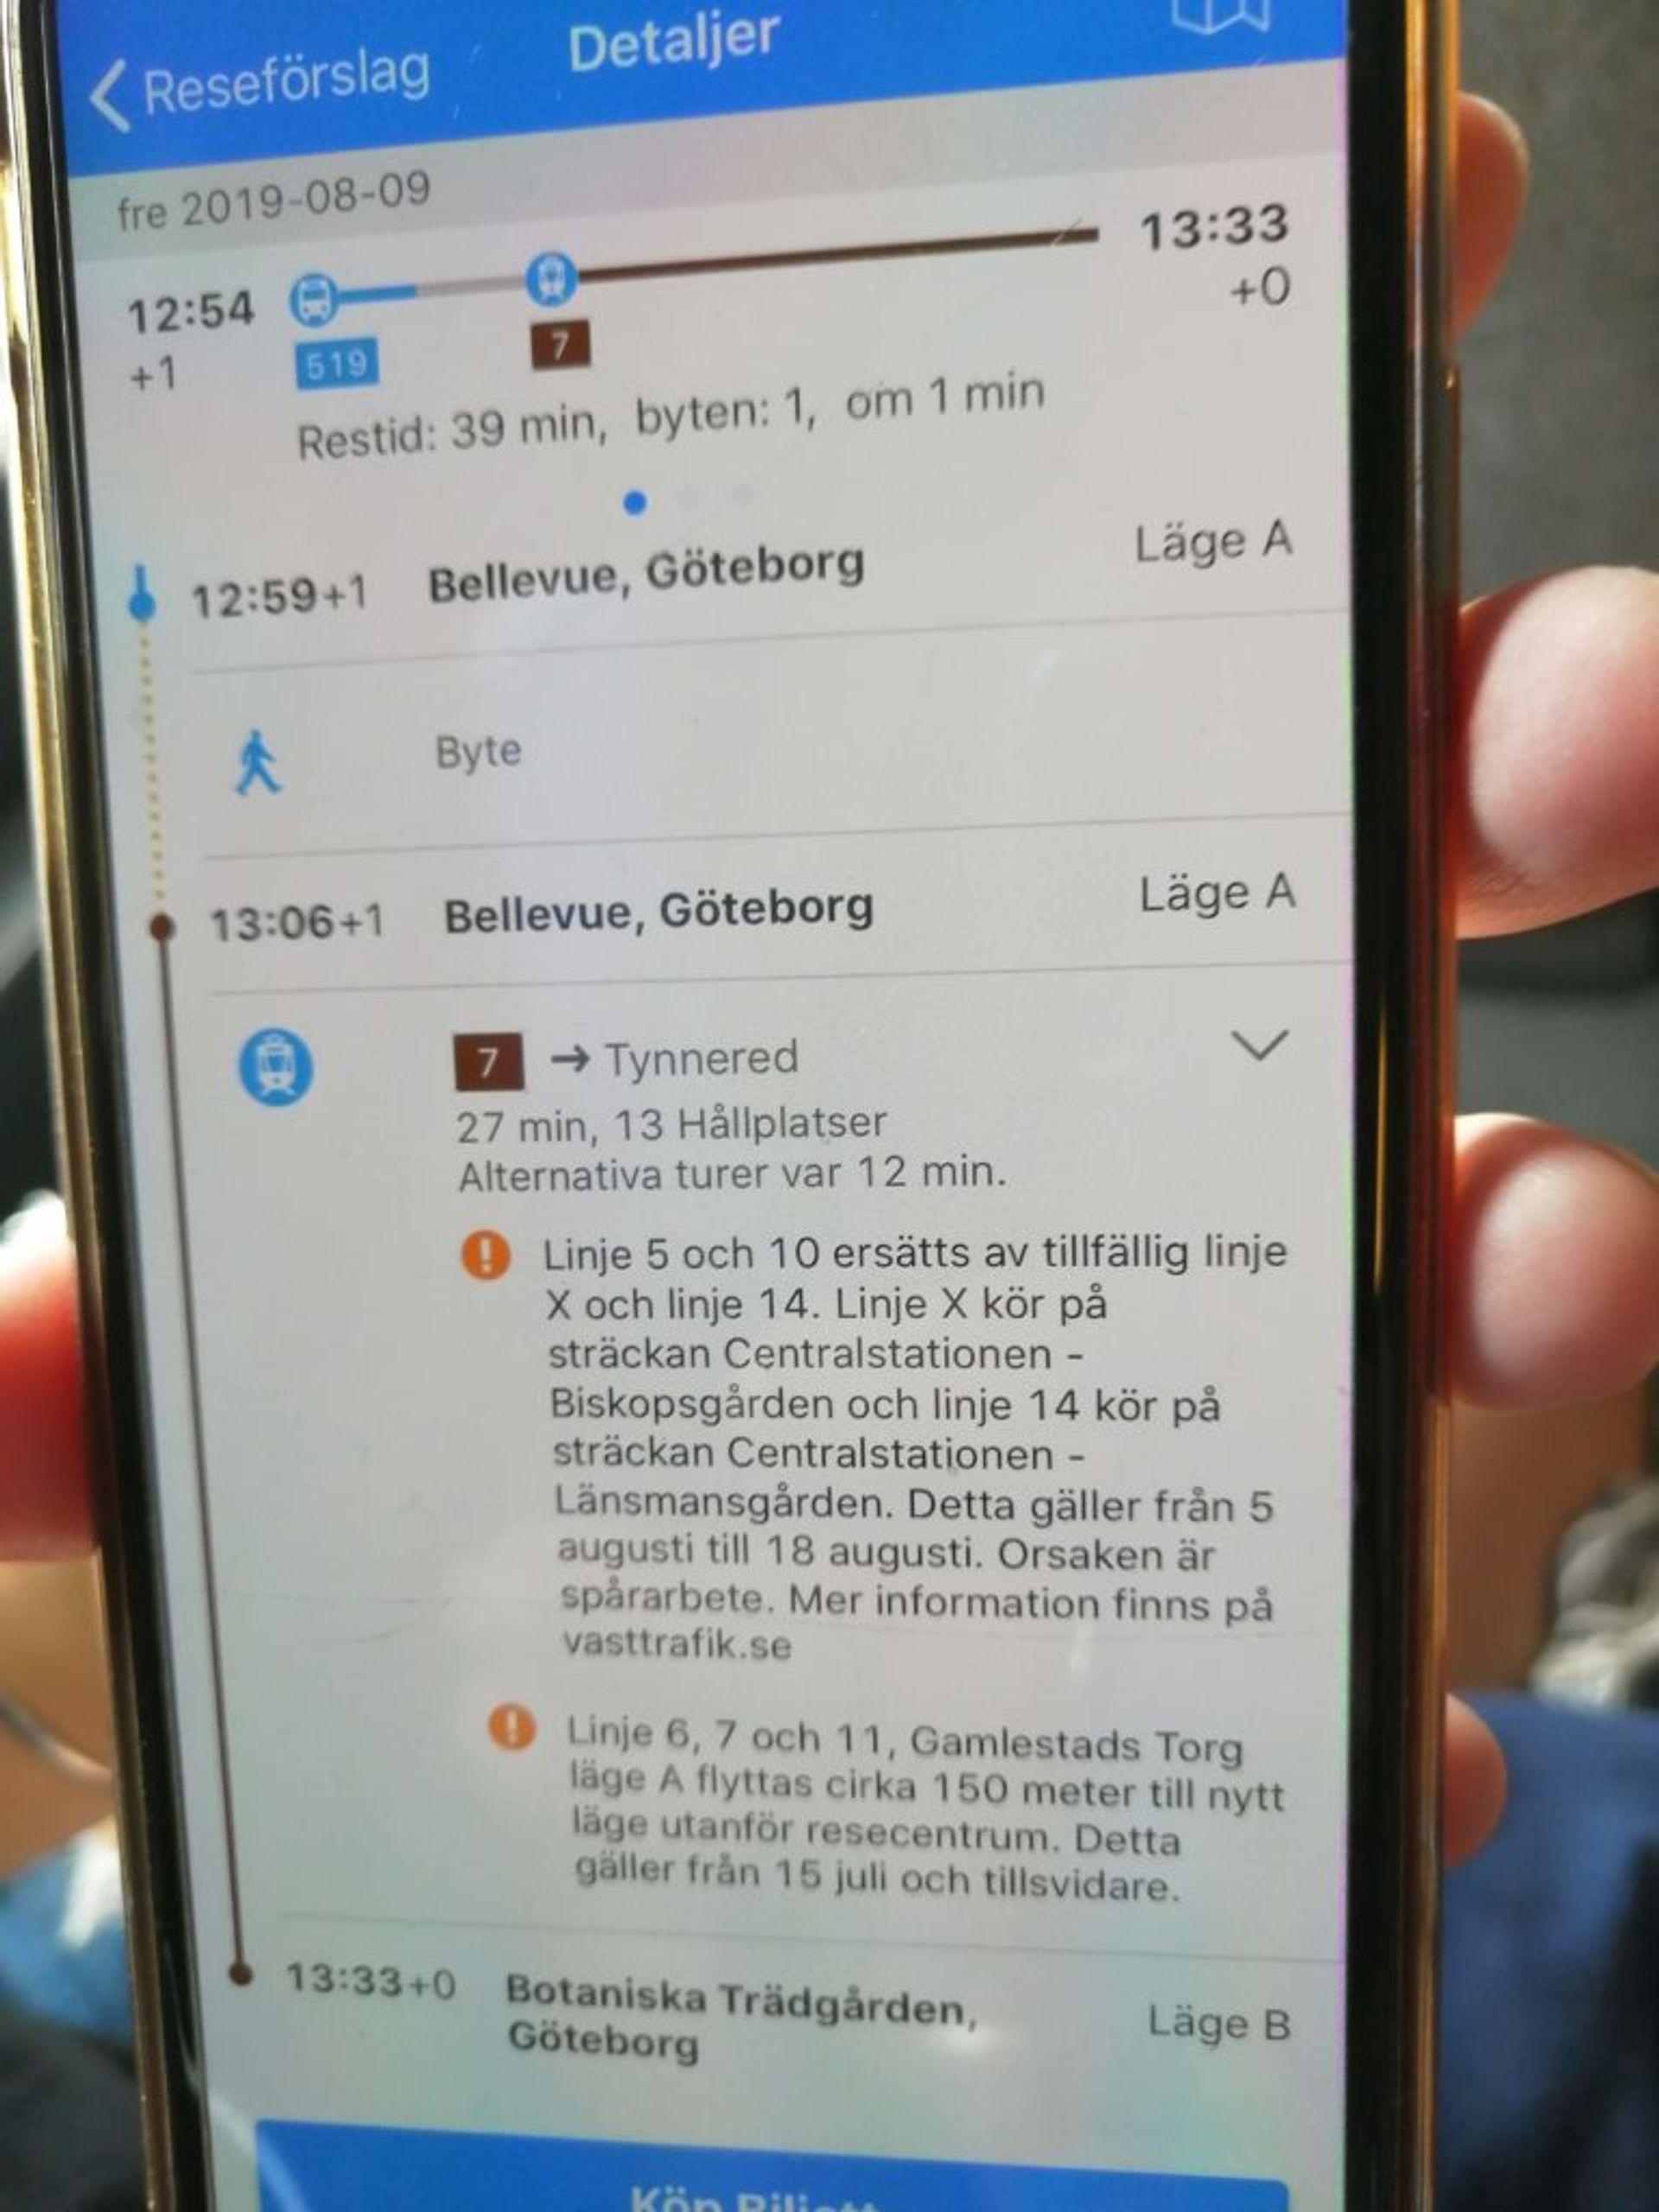 Västtrafik app showing directions.